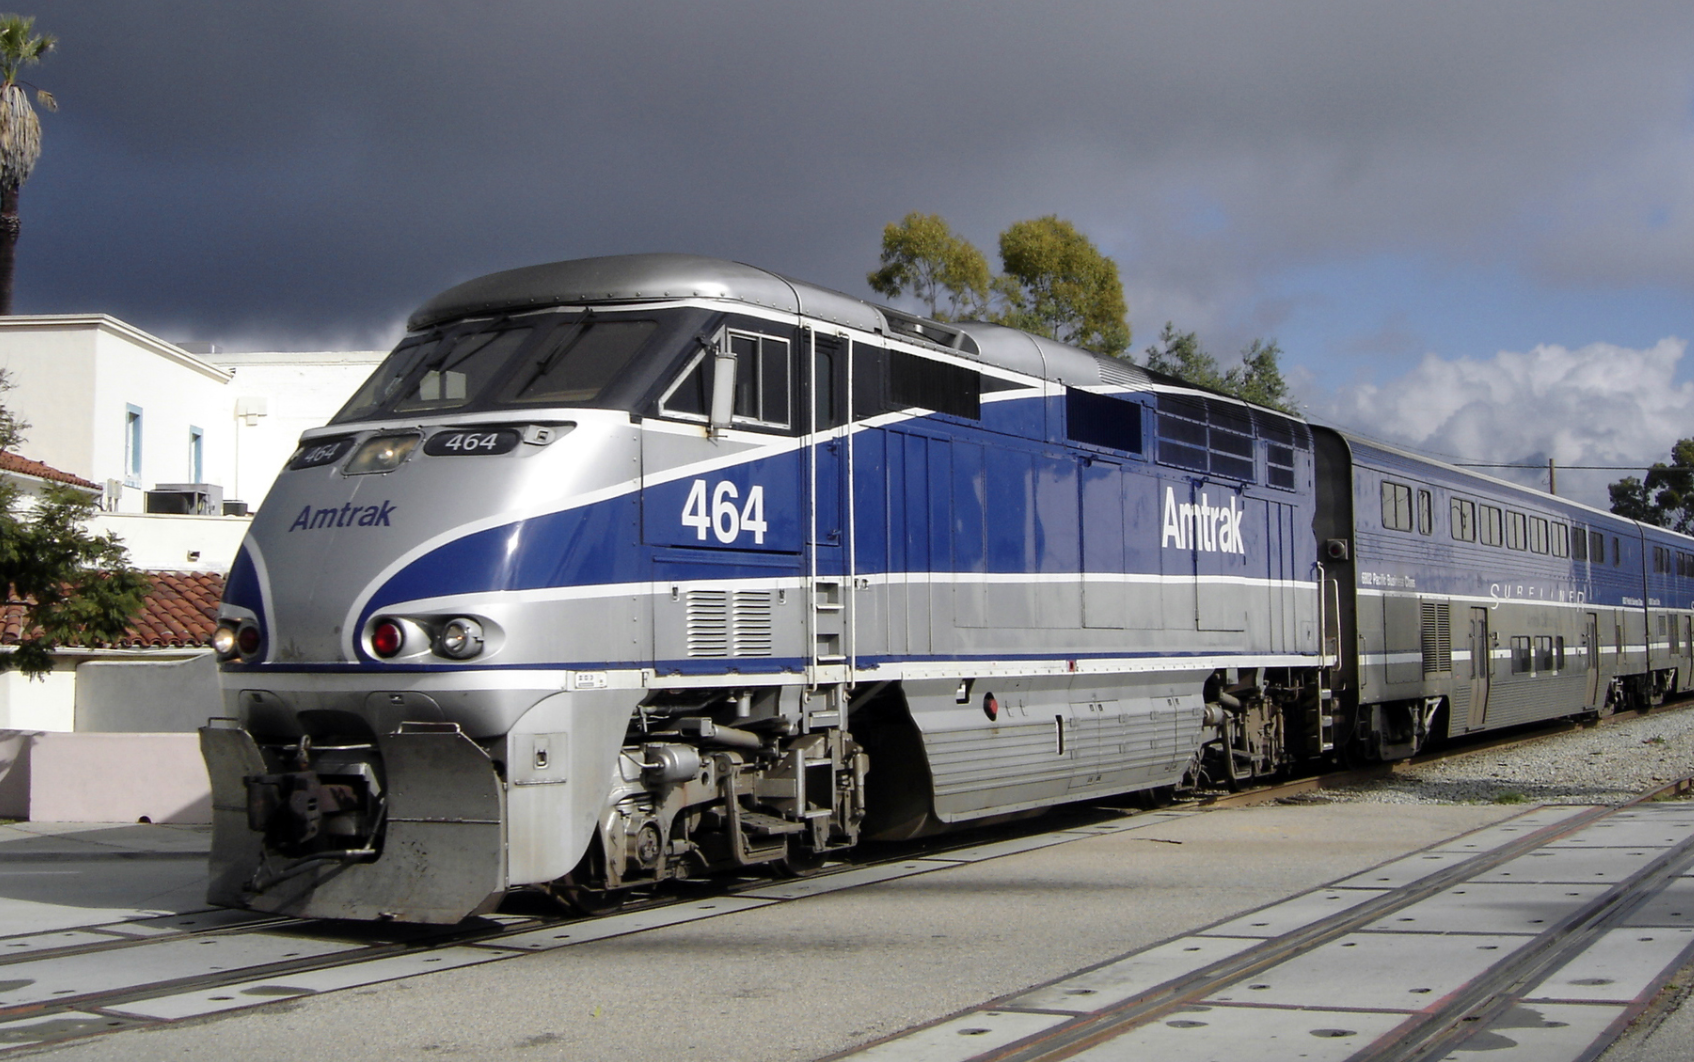 Amtrak Train Derails In Washington State Leaving 6 Dead Photo:Nabukodinosaure, WikiCommons,No Change